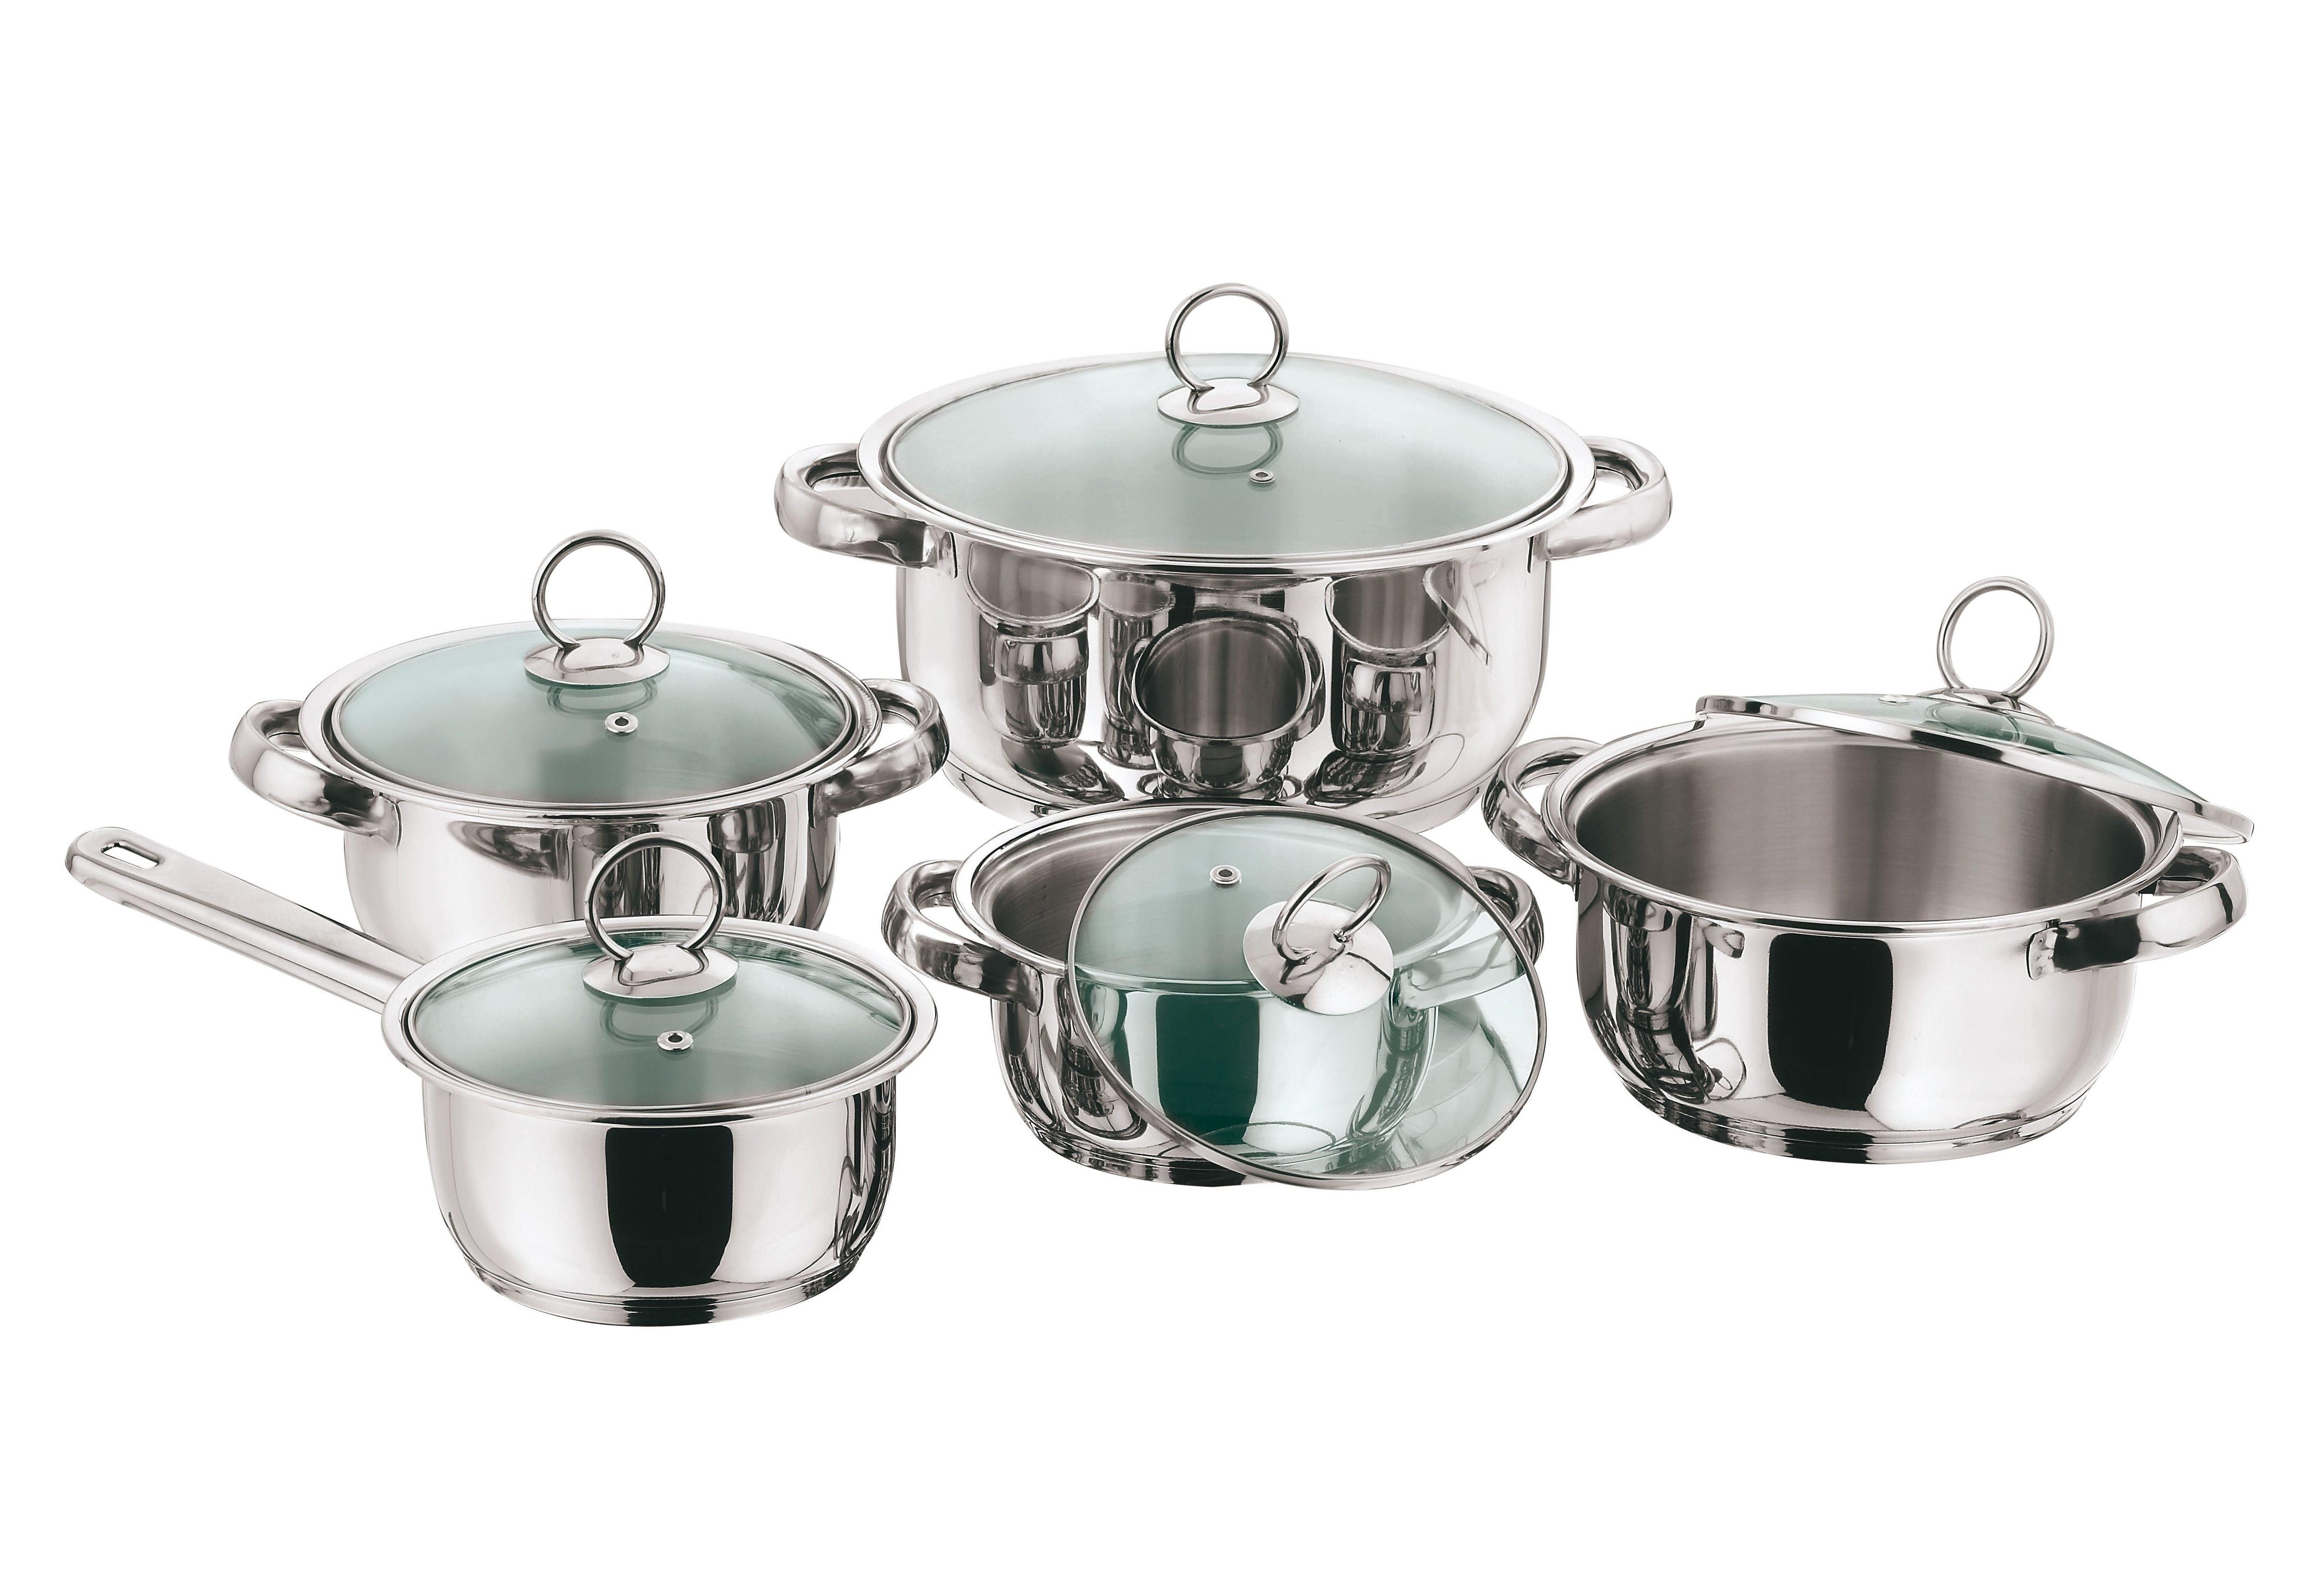 KING Topf-Set New Silver Line Glass (Set, 10-tlg.) silberfarben Topfsets Töpfe Haushaltswaren Topf